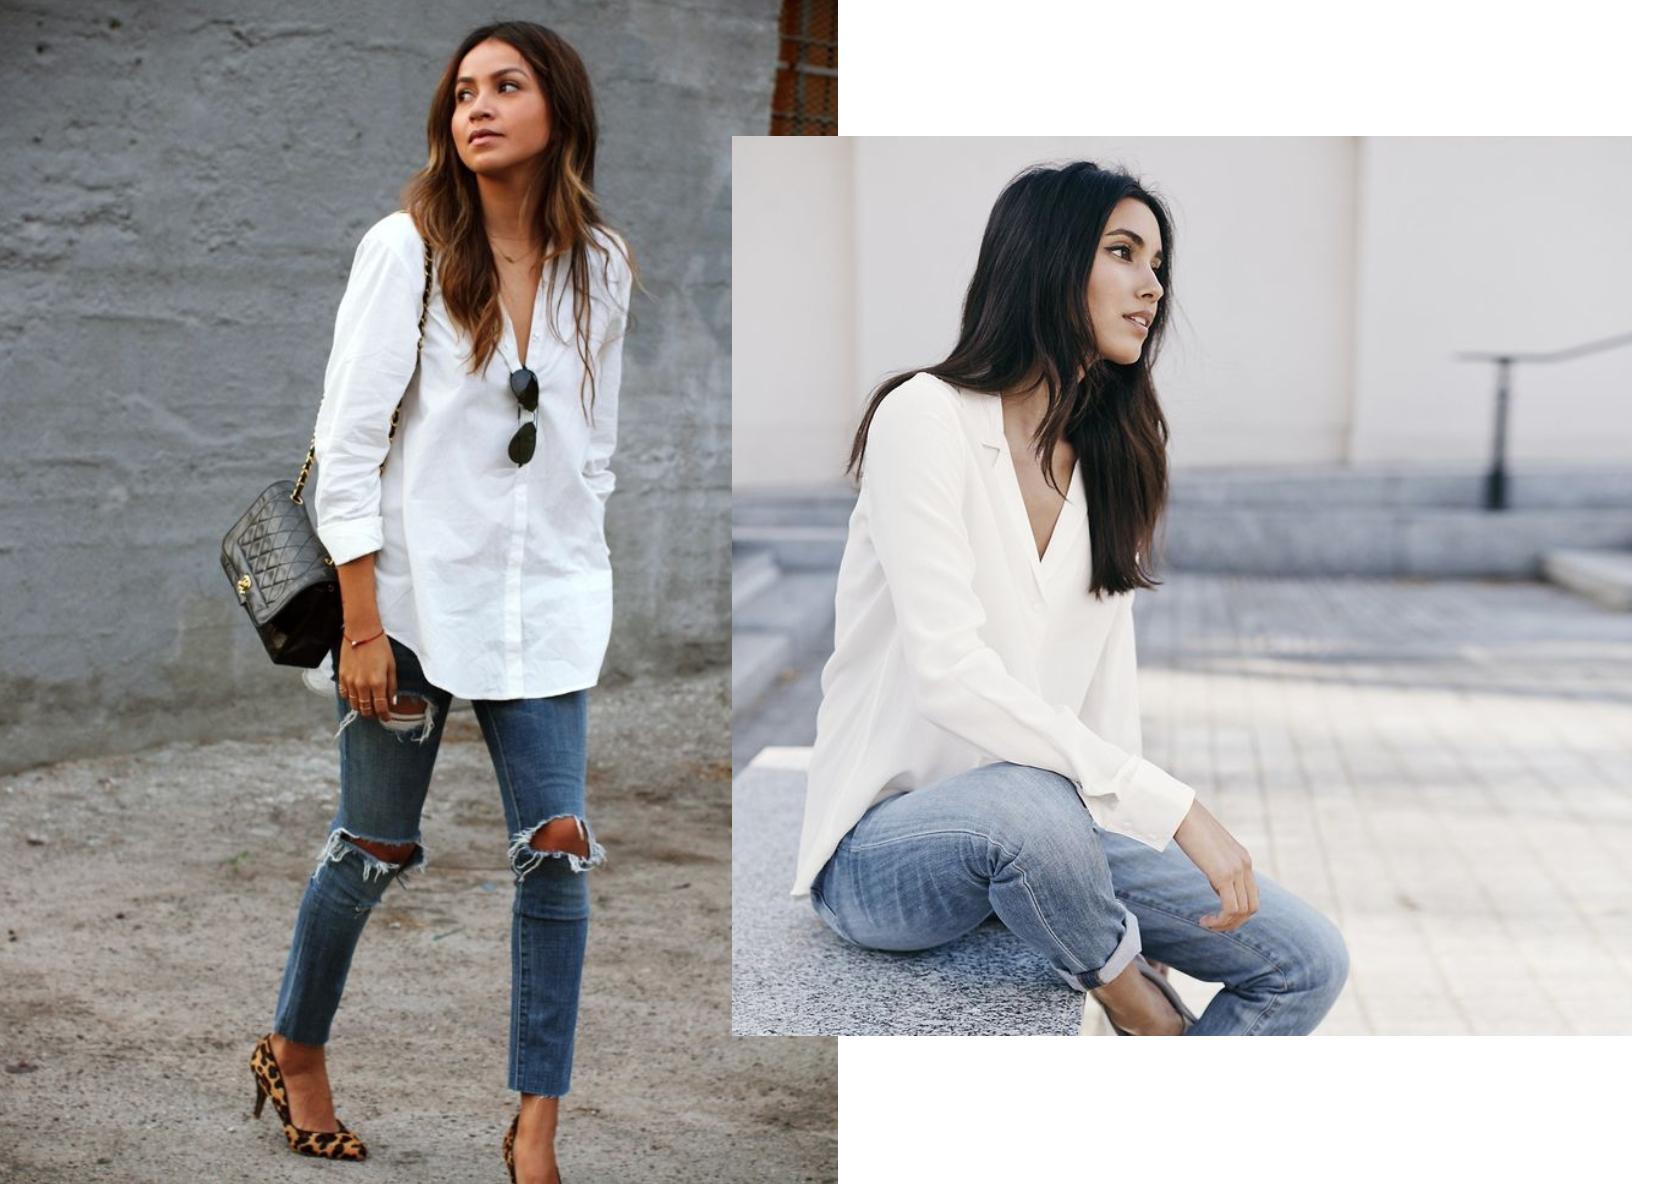 bb6efb44cdf Inspo-Blue-Jeans-White-Shirt-001 ...